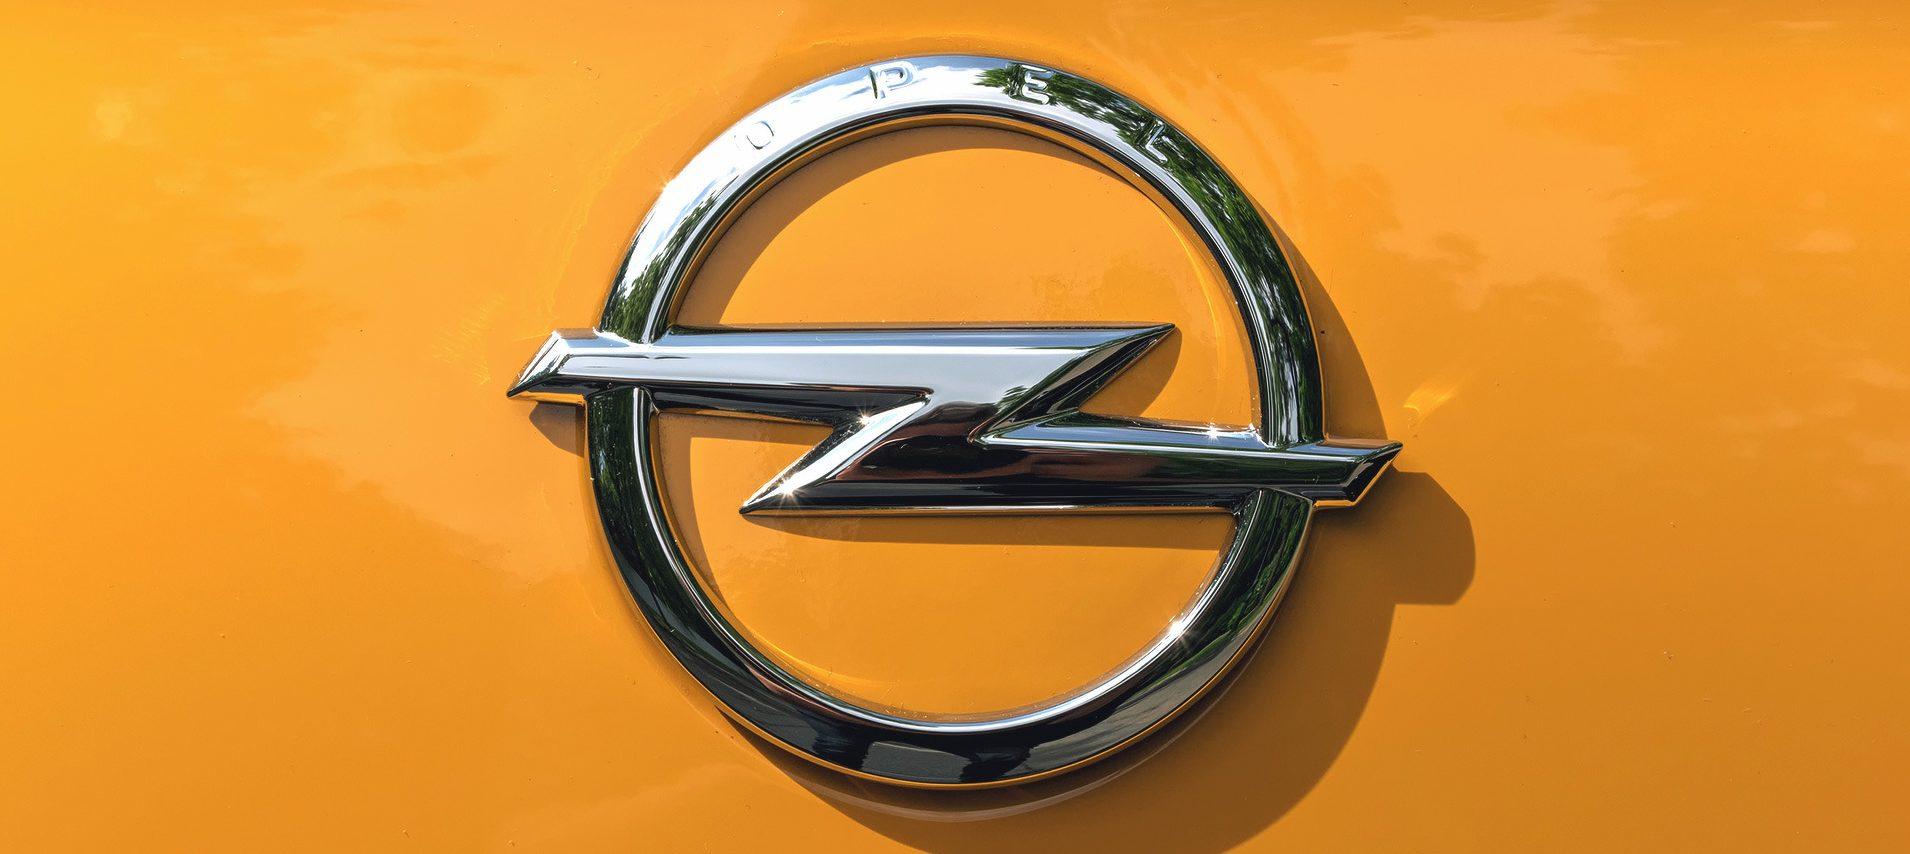 Ремонт Опель (Opel) в Минске